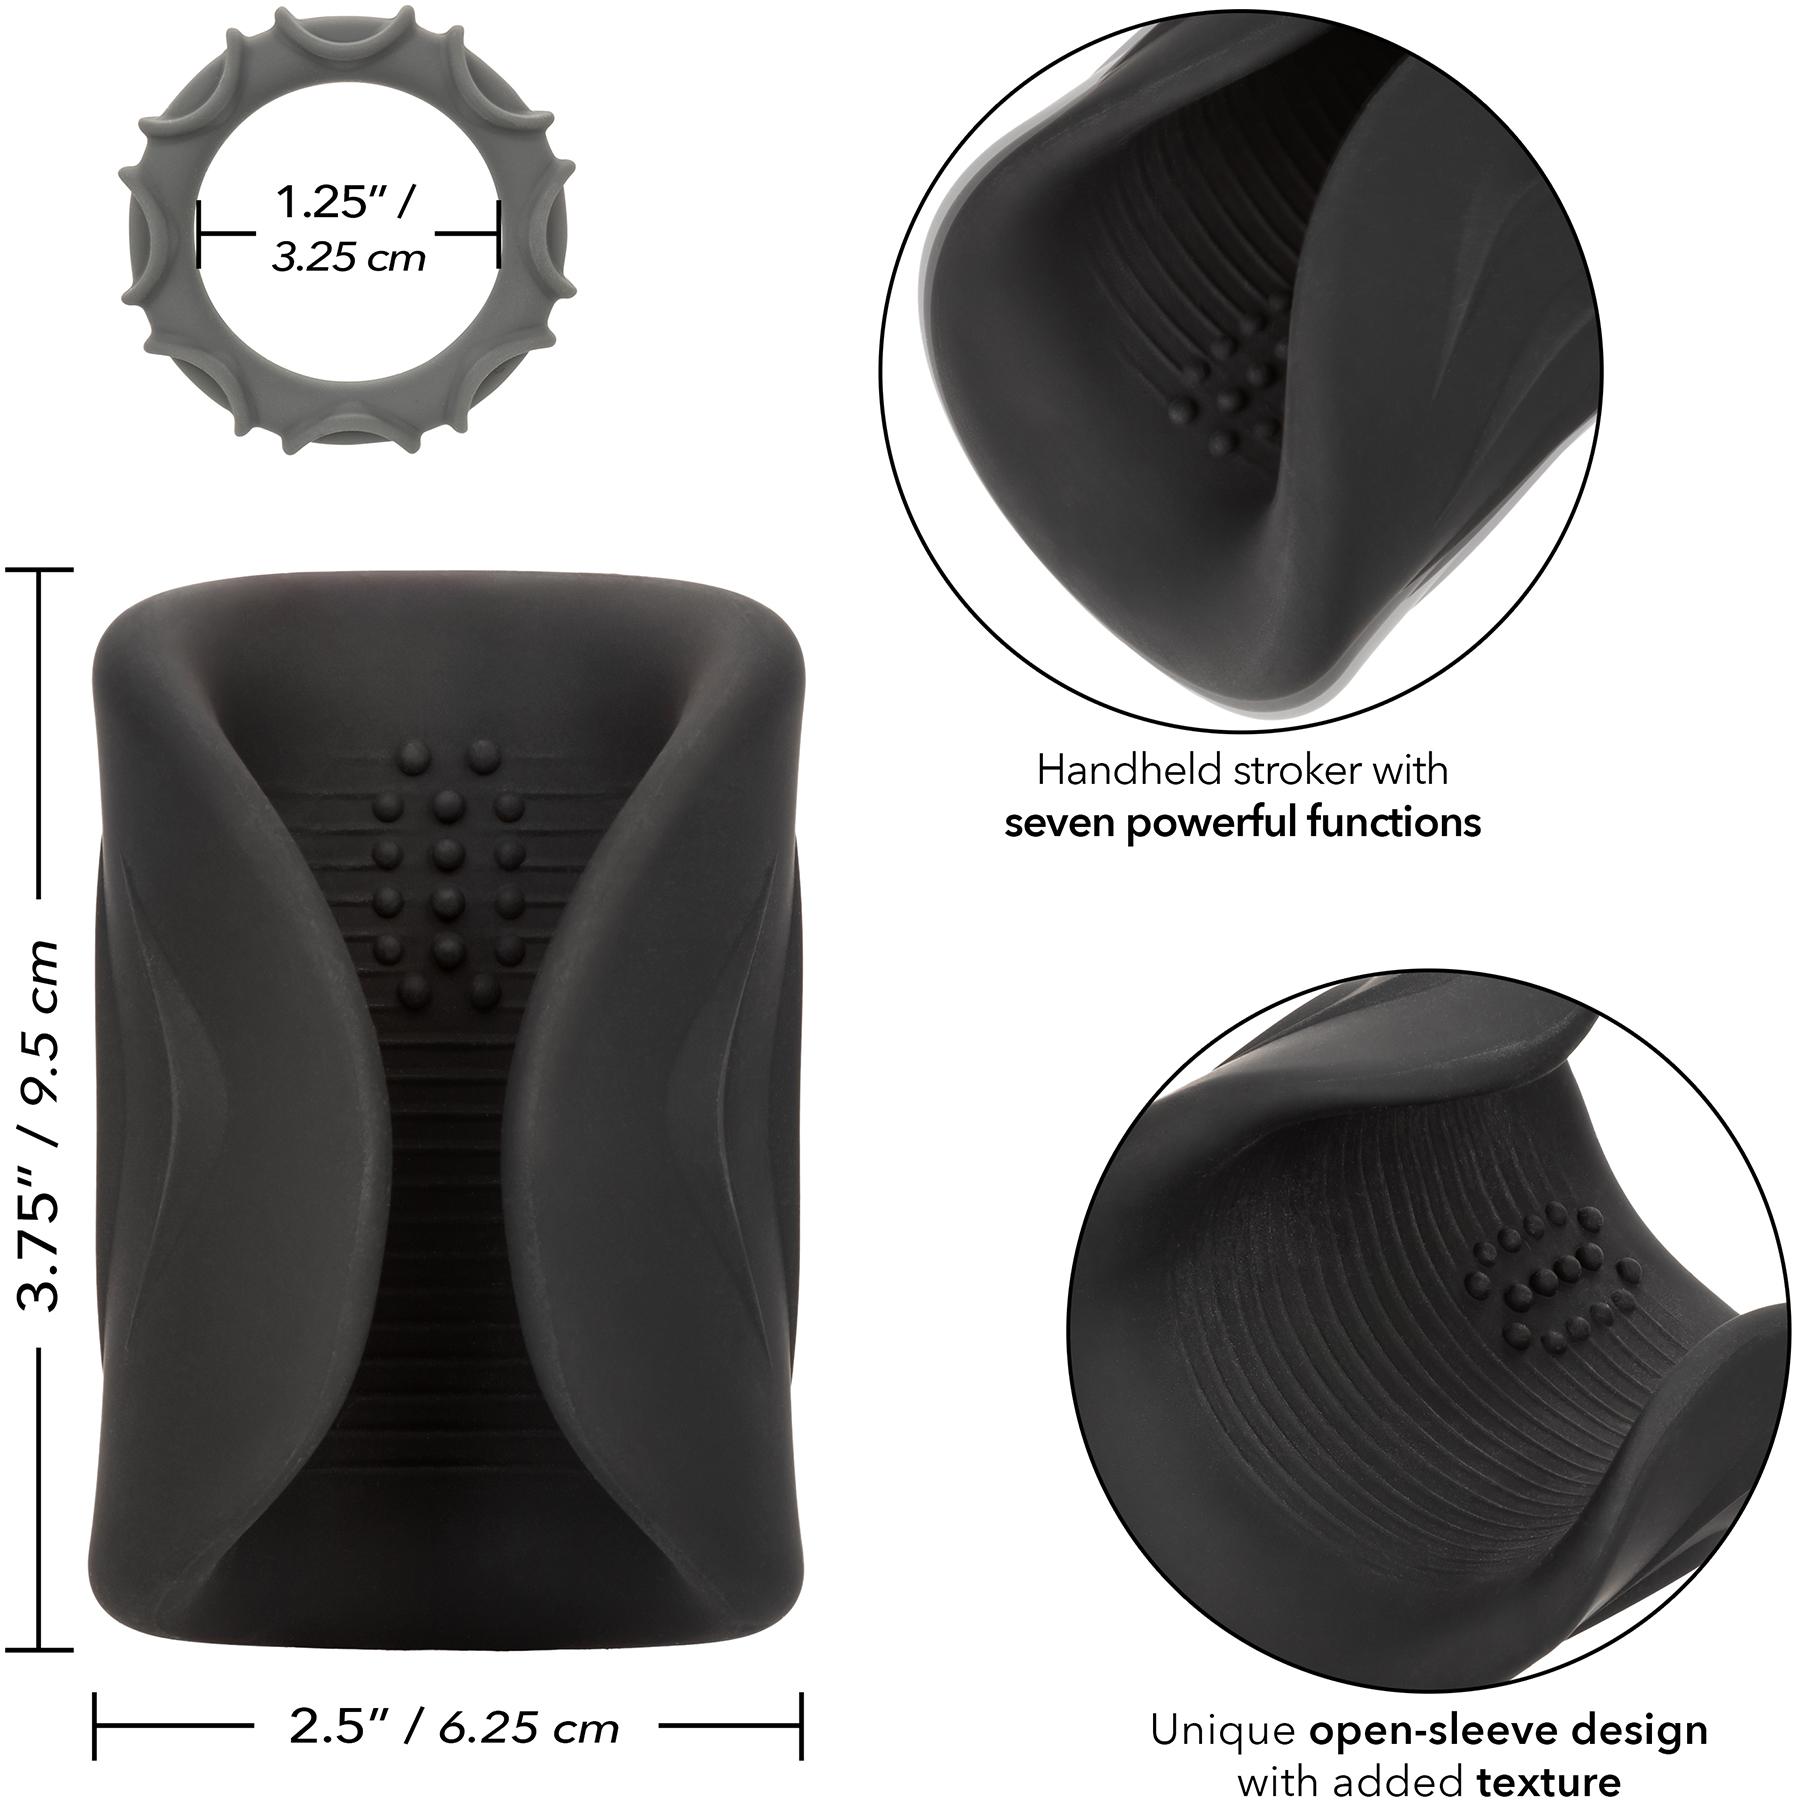 Optimum Power Pro Stroker Silicone Rechargeable Penis Masturbator - Measurements